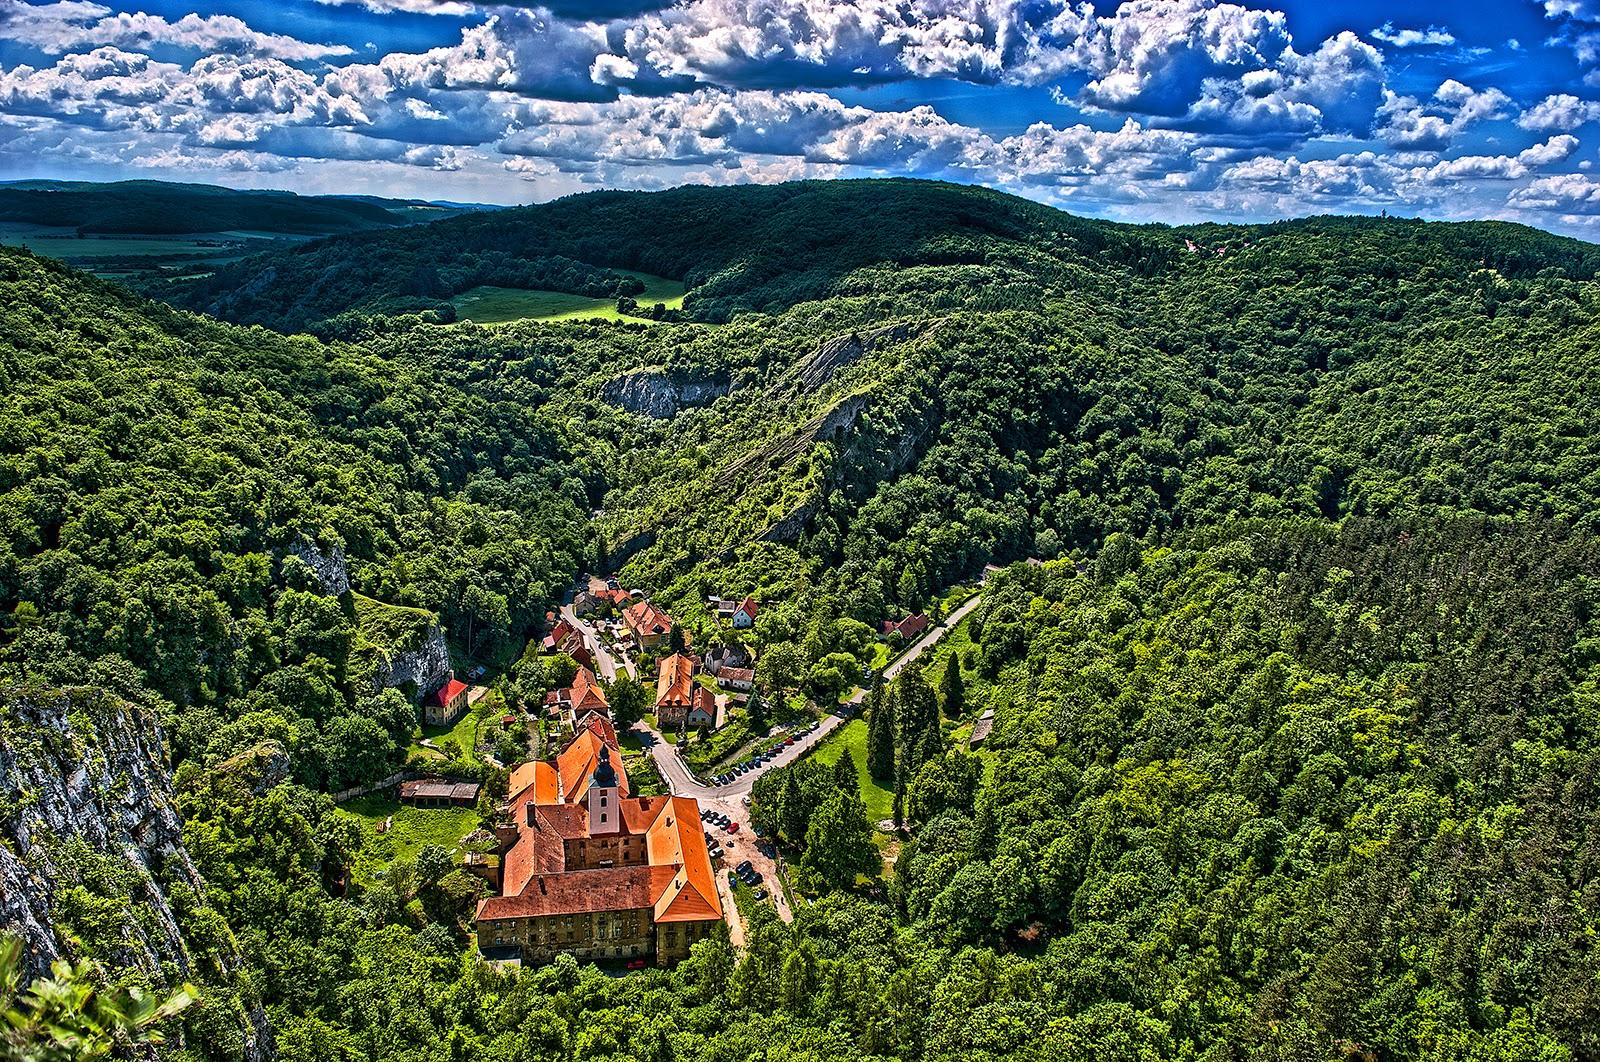 Svaty Jan Pod Skalou, Czech Republic